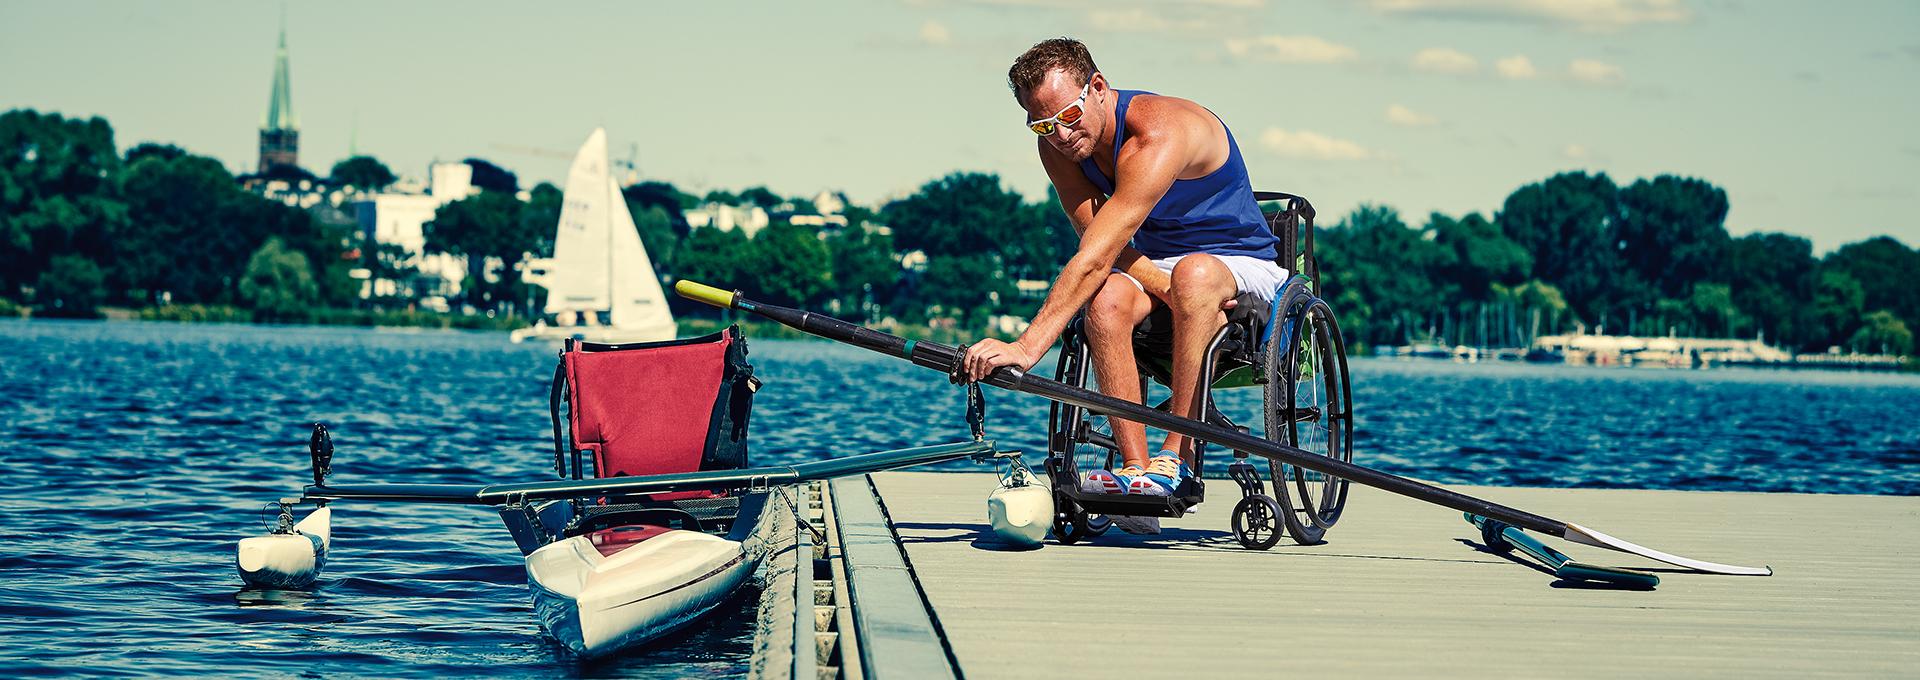 DIETZ_Bild_Rollstuhl_AS01RF_Vorbereitung_02